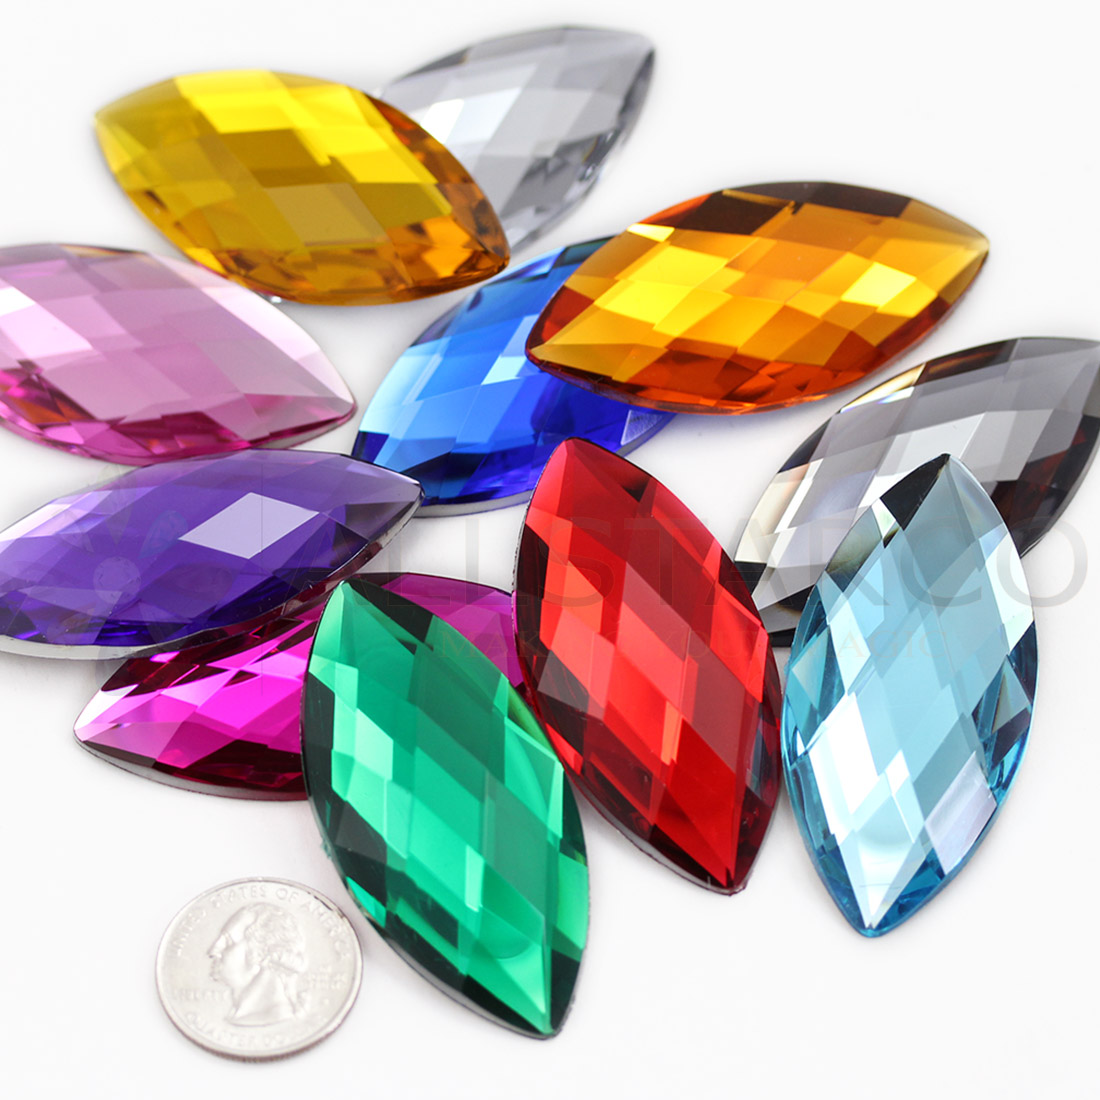 navette large marquise horse eye acrylic flat back rhinestones gems for cosplay